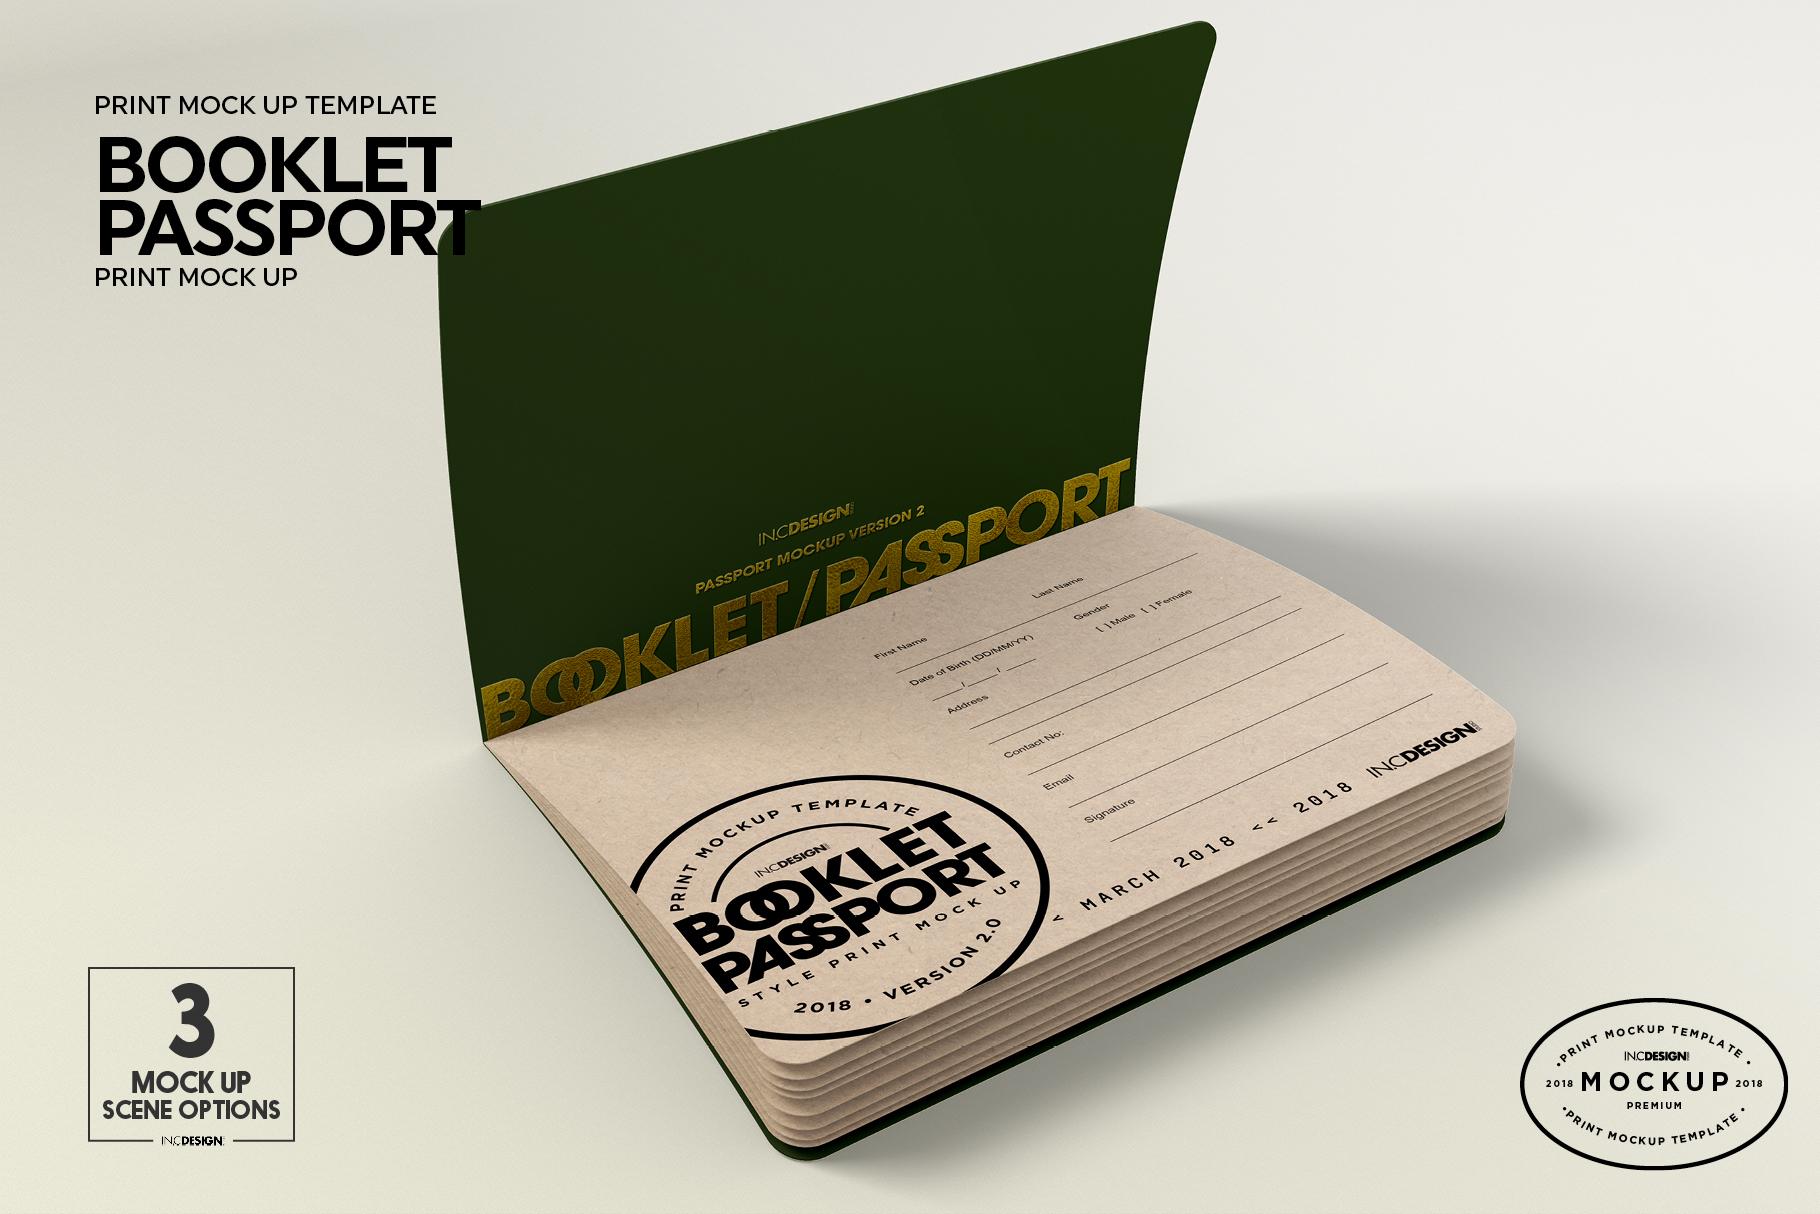 Booklet Passport Print MockUp example image 7